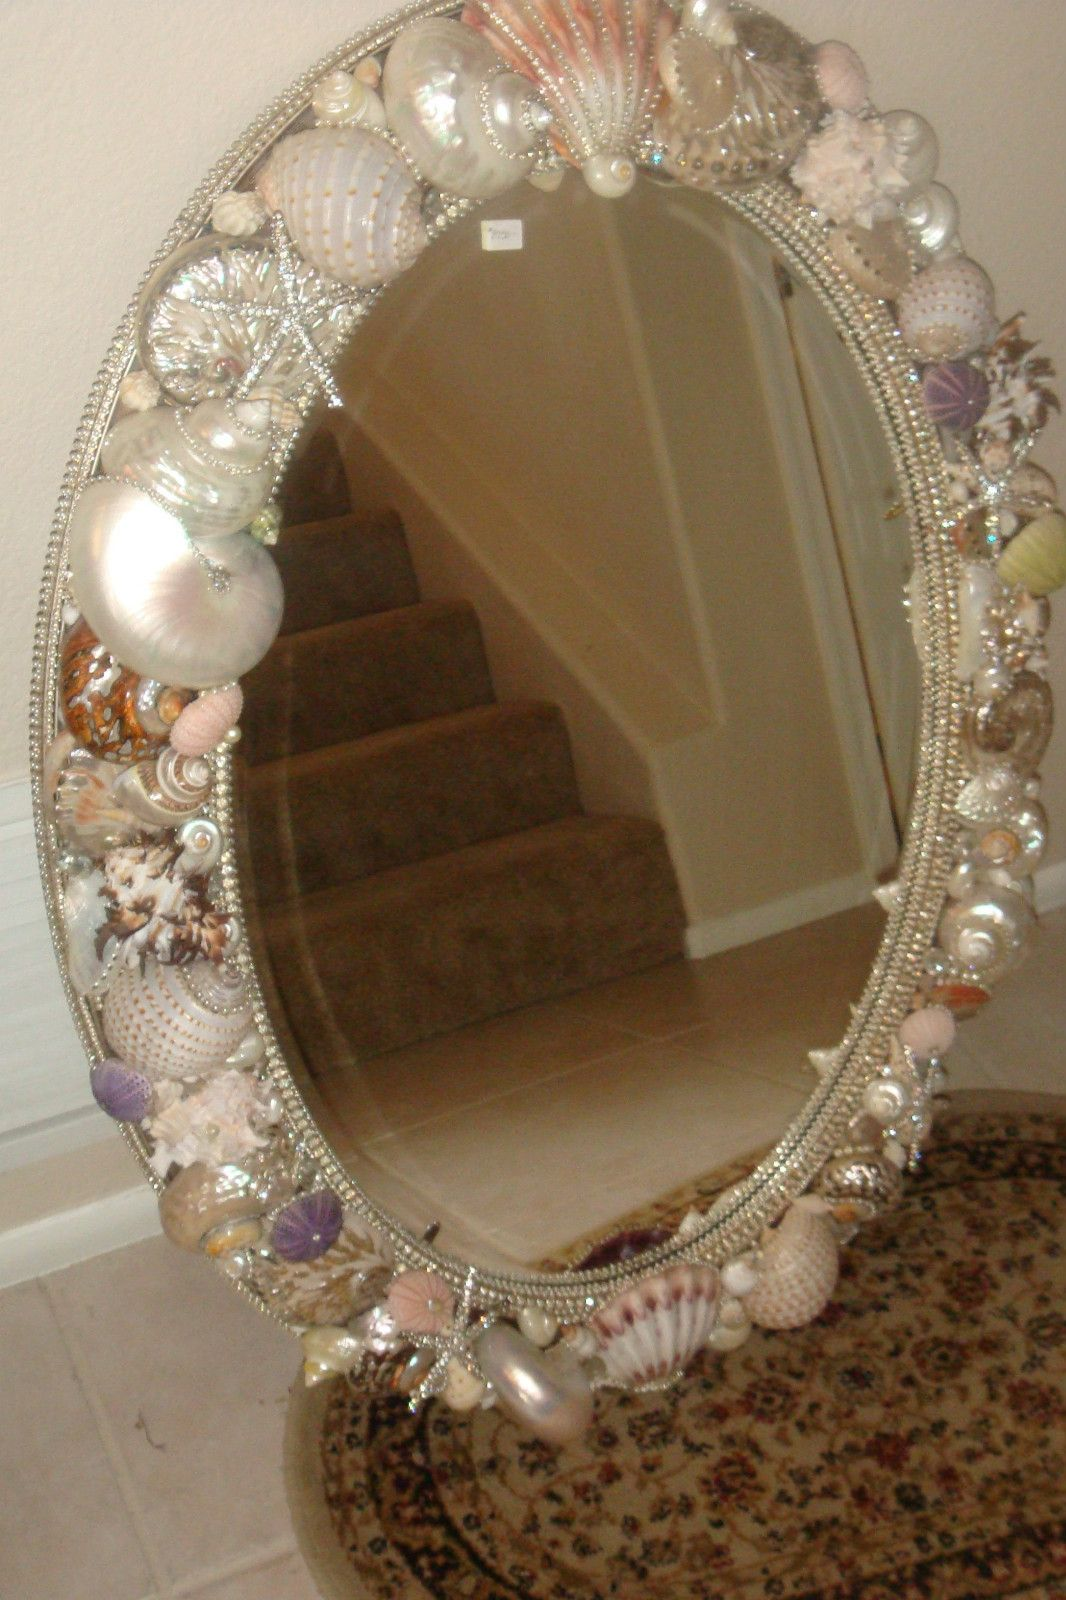 Douglas Cloutier Sea Shell Mirror Mermaid Bathroom Decor